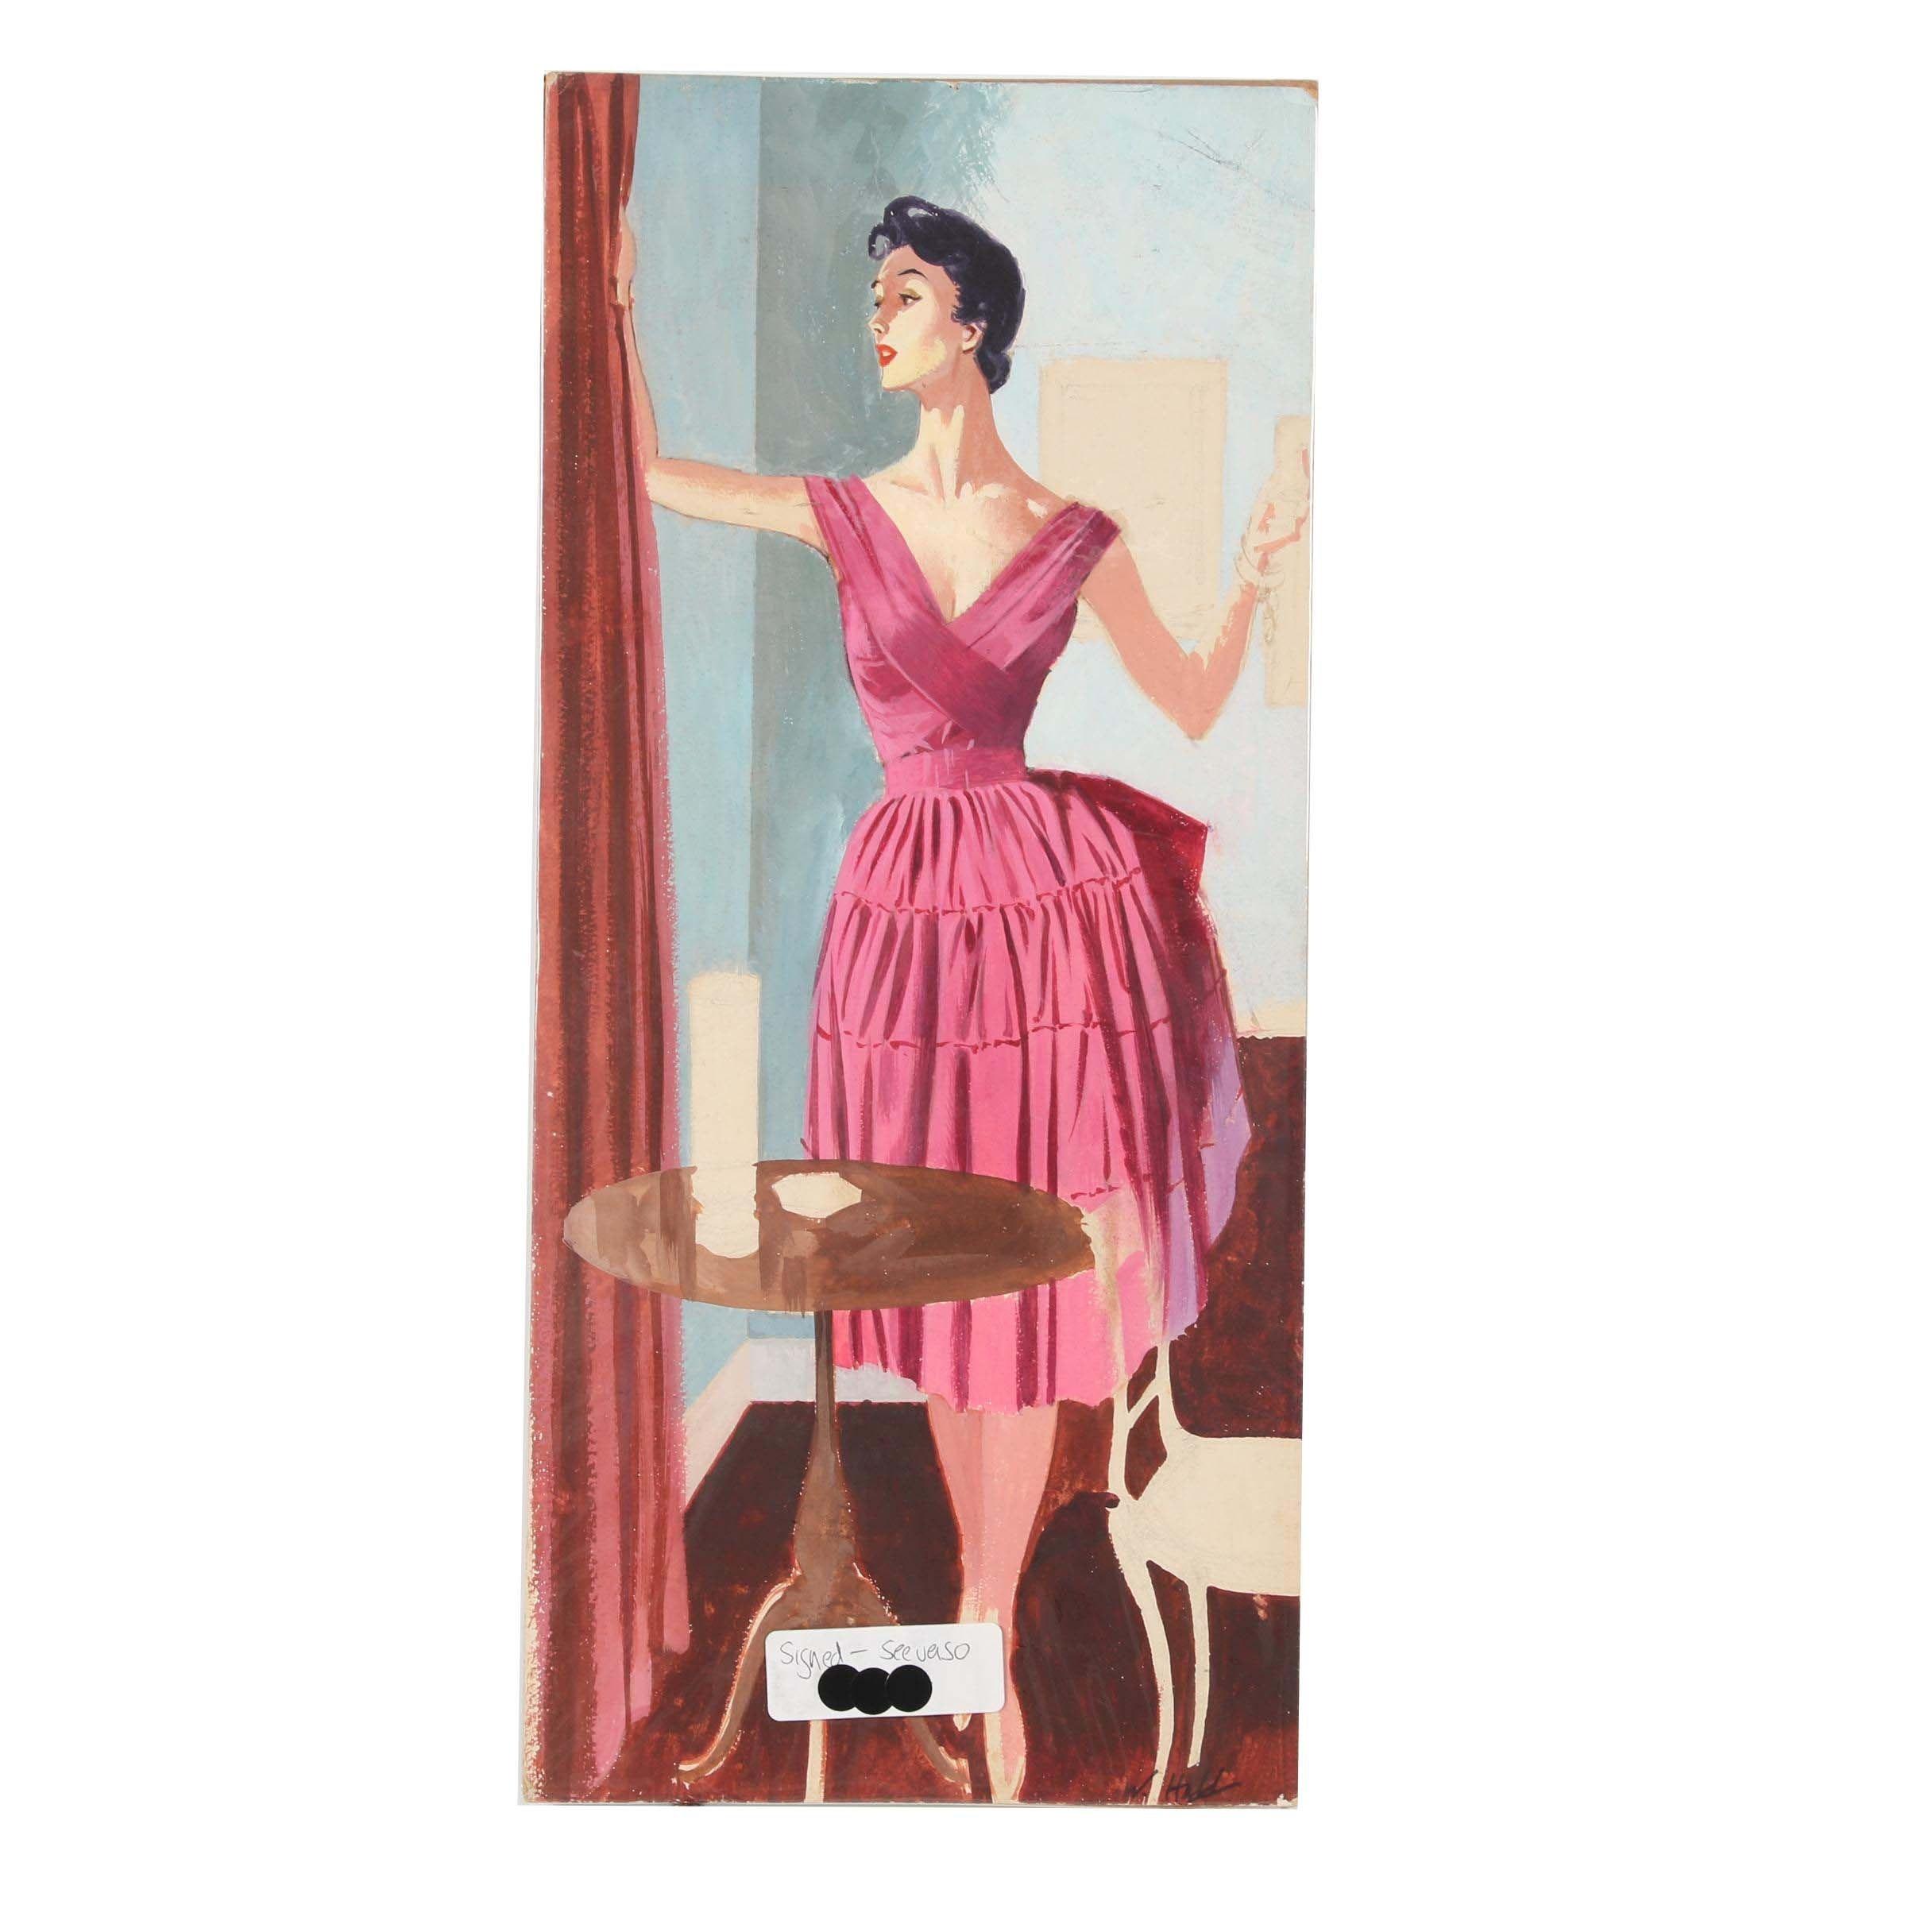 Wayne Hall Gouache Advertisement Illustration